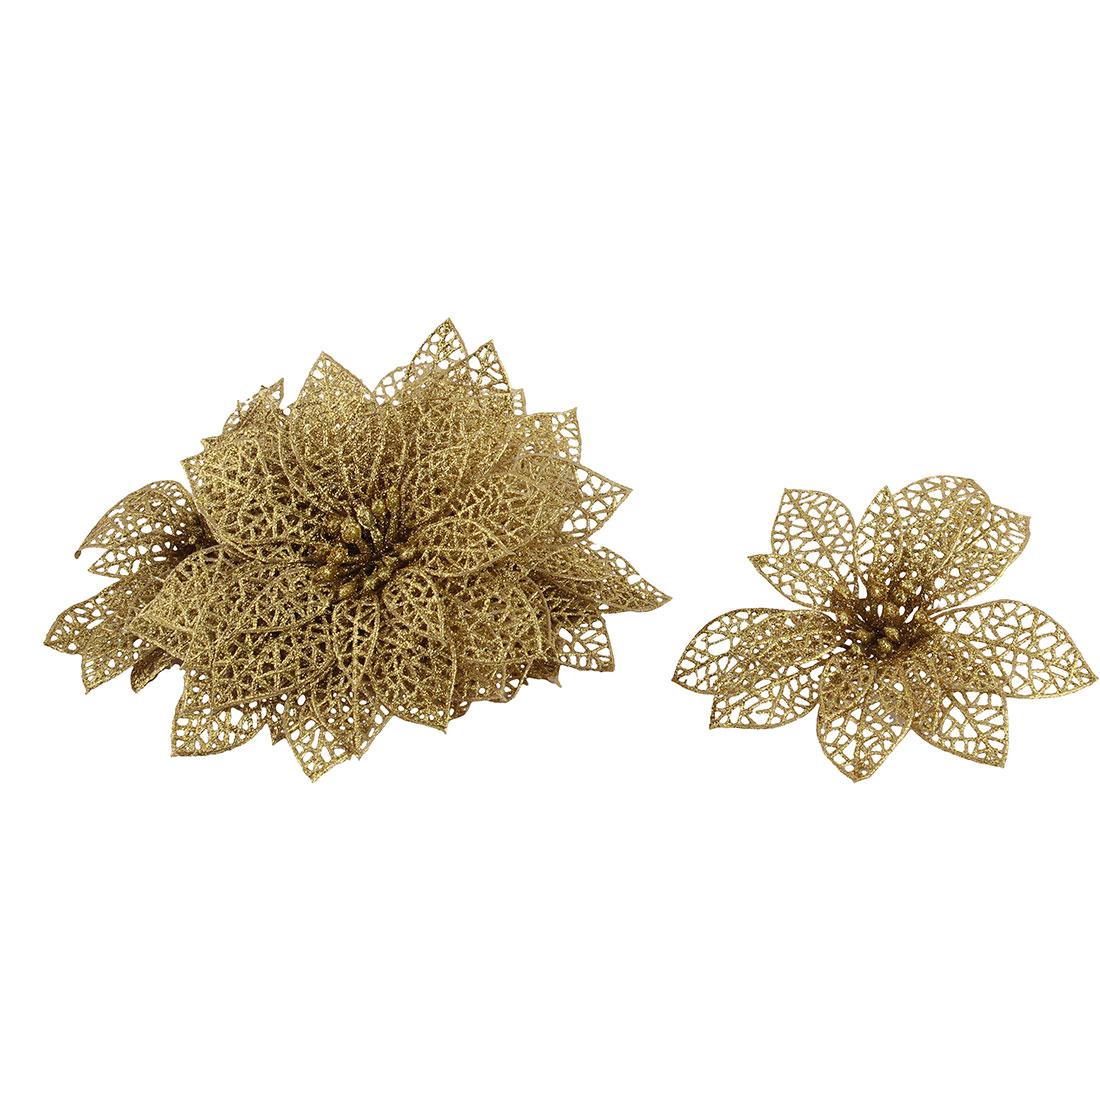 Festival Christmas Tree Artificial Glitter Hanging Ornaments Flower 10 PCS